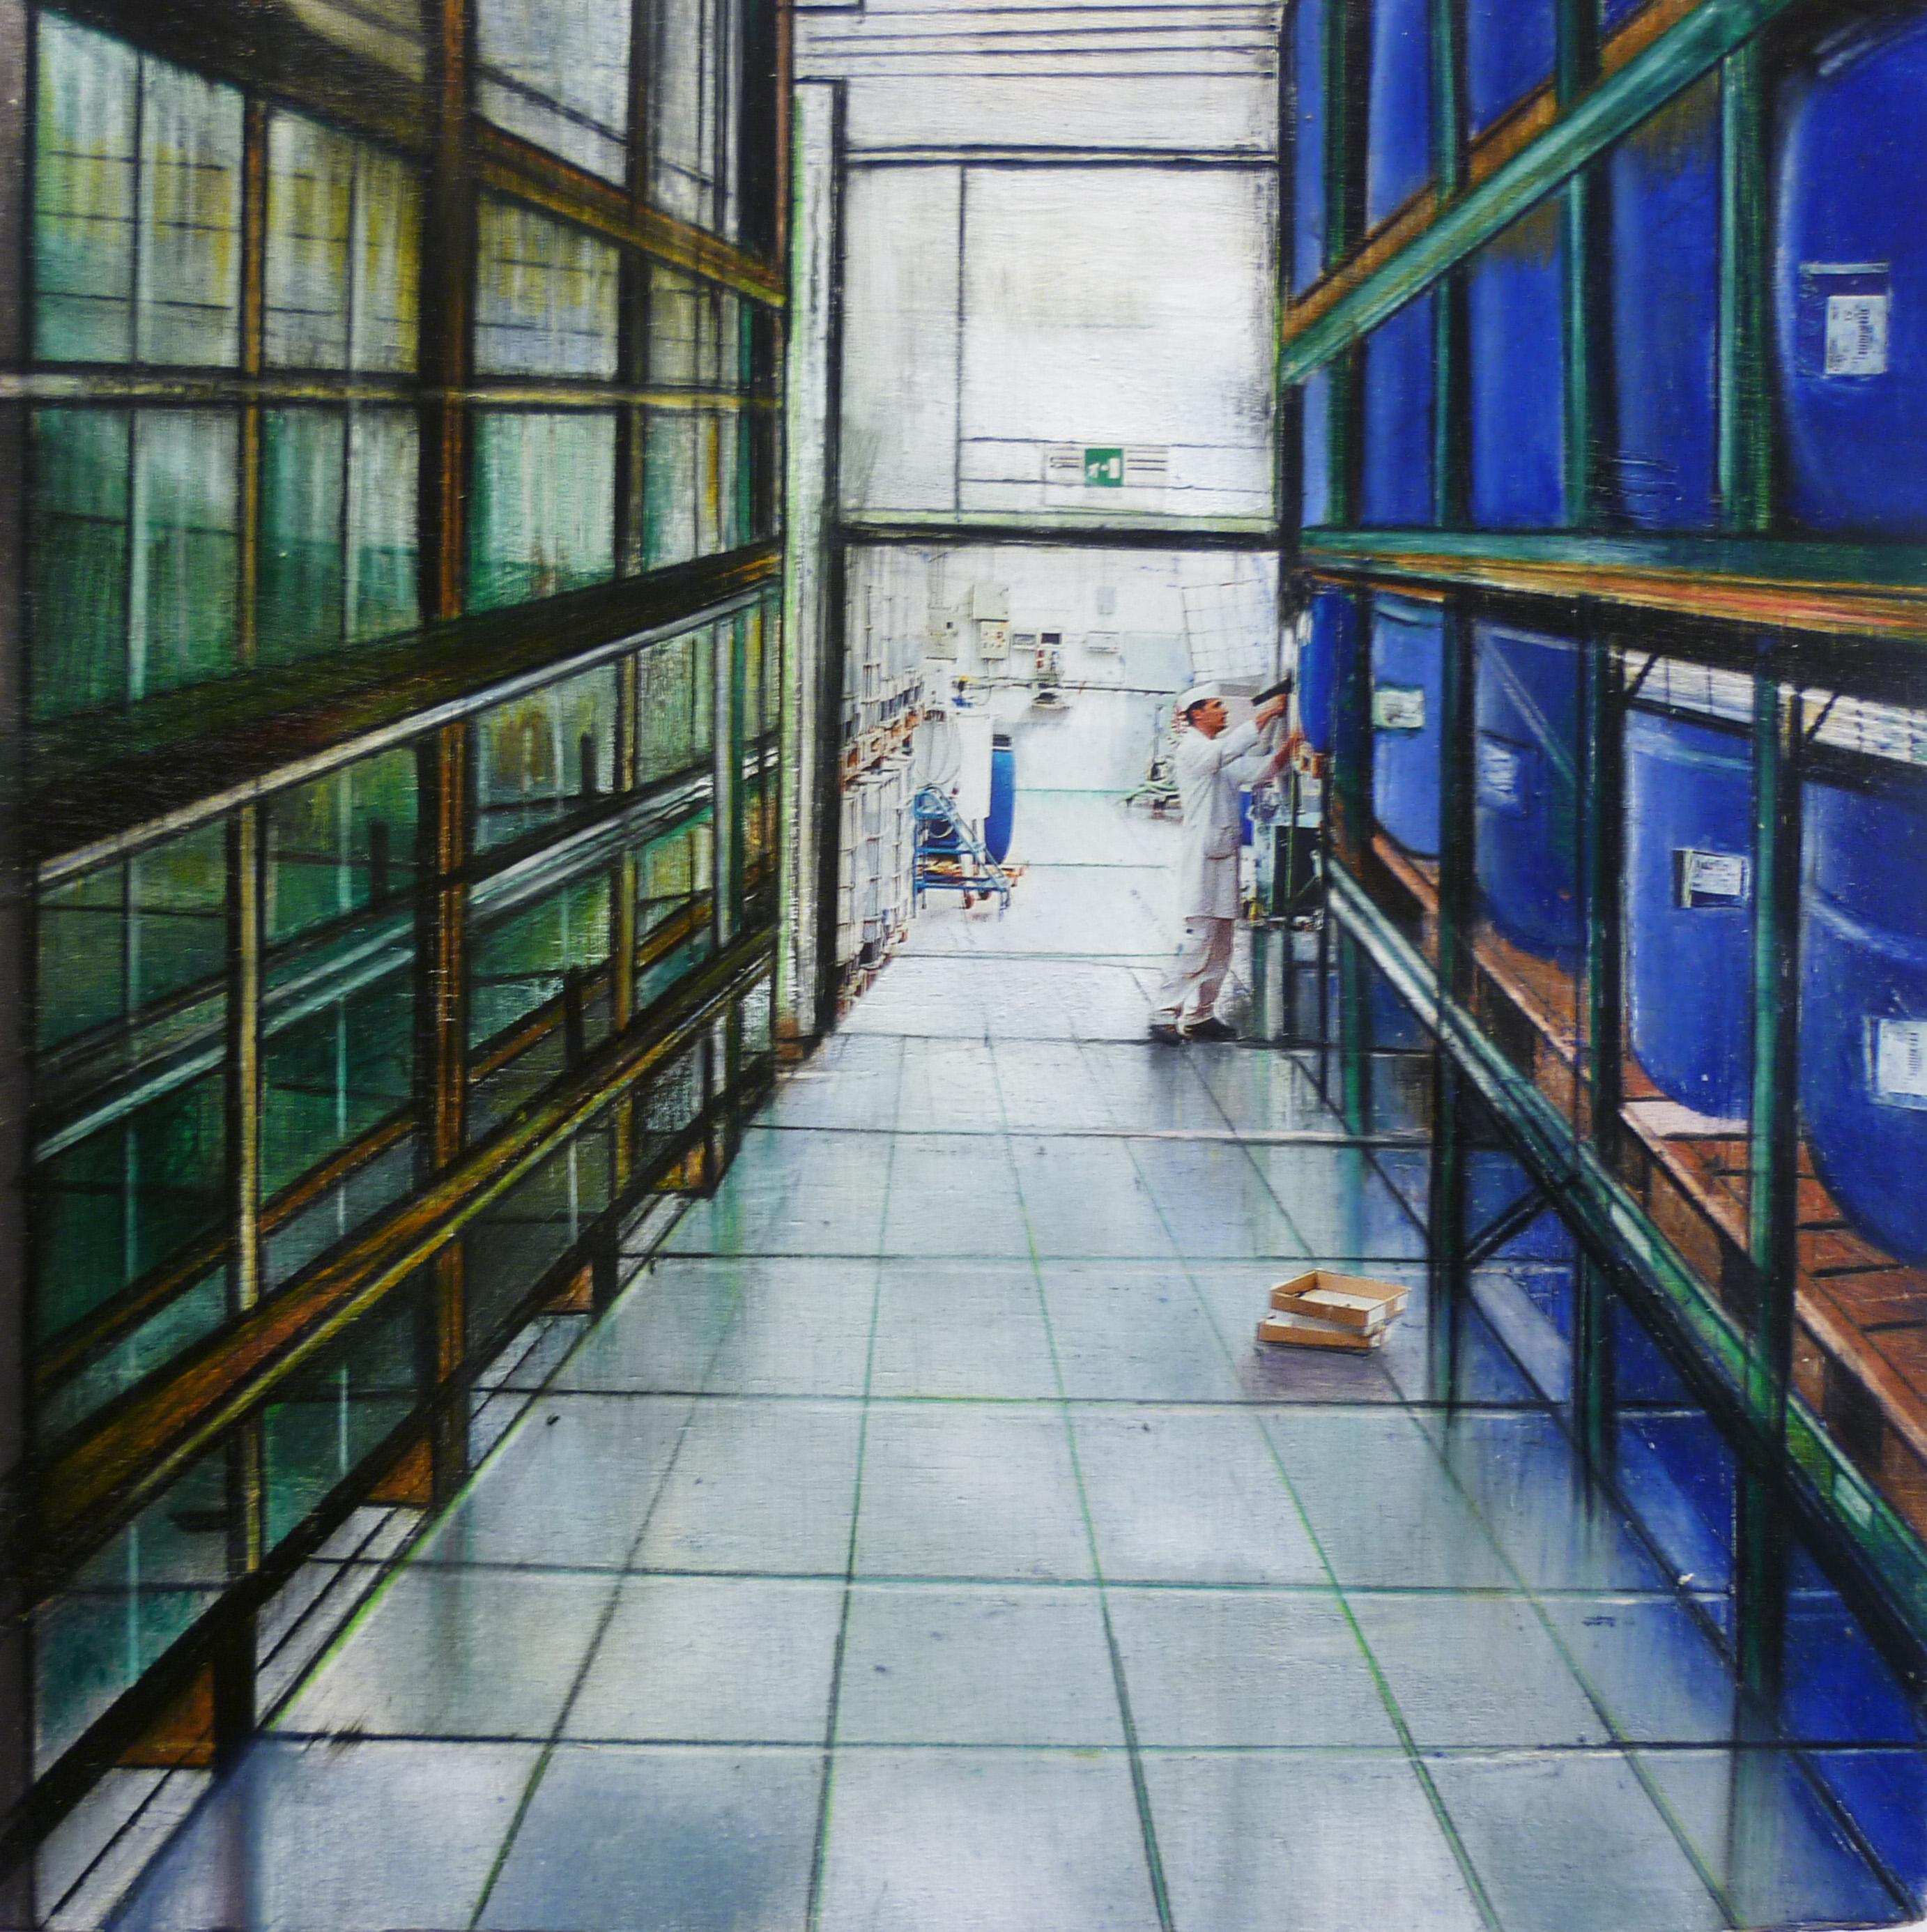 Deposito merci - 2014 - tecnica mista su tavola cm 22,5 x22,5